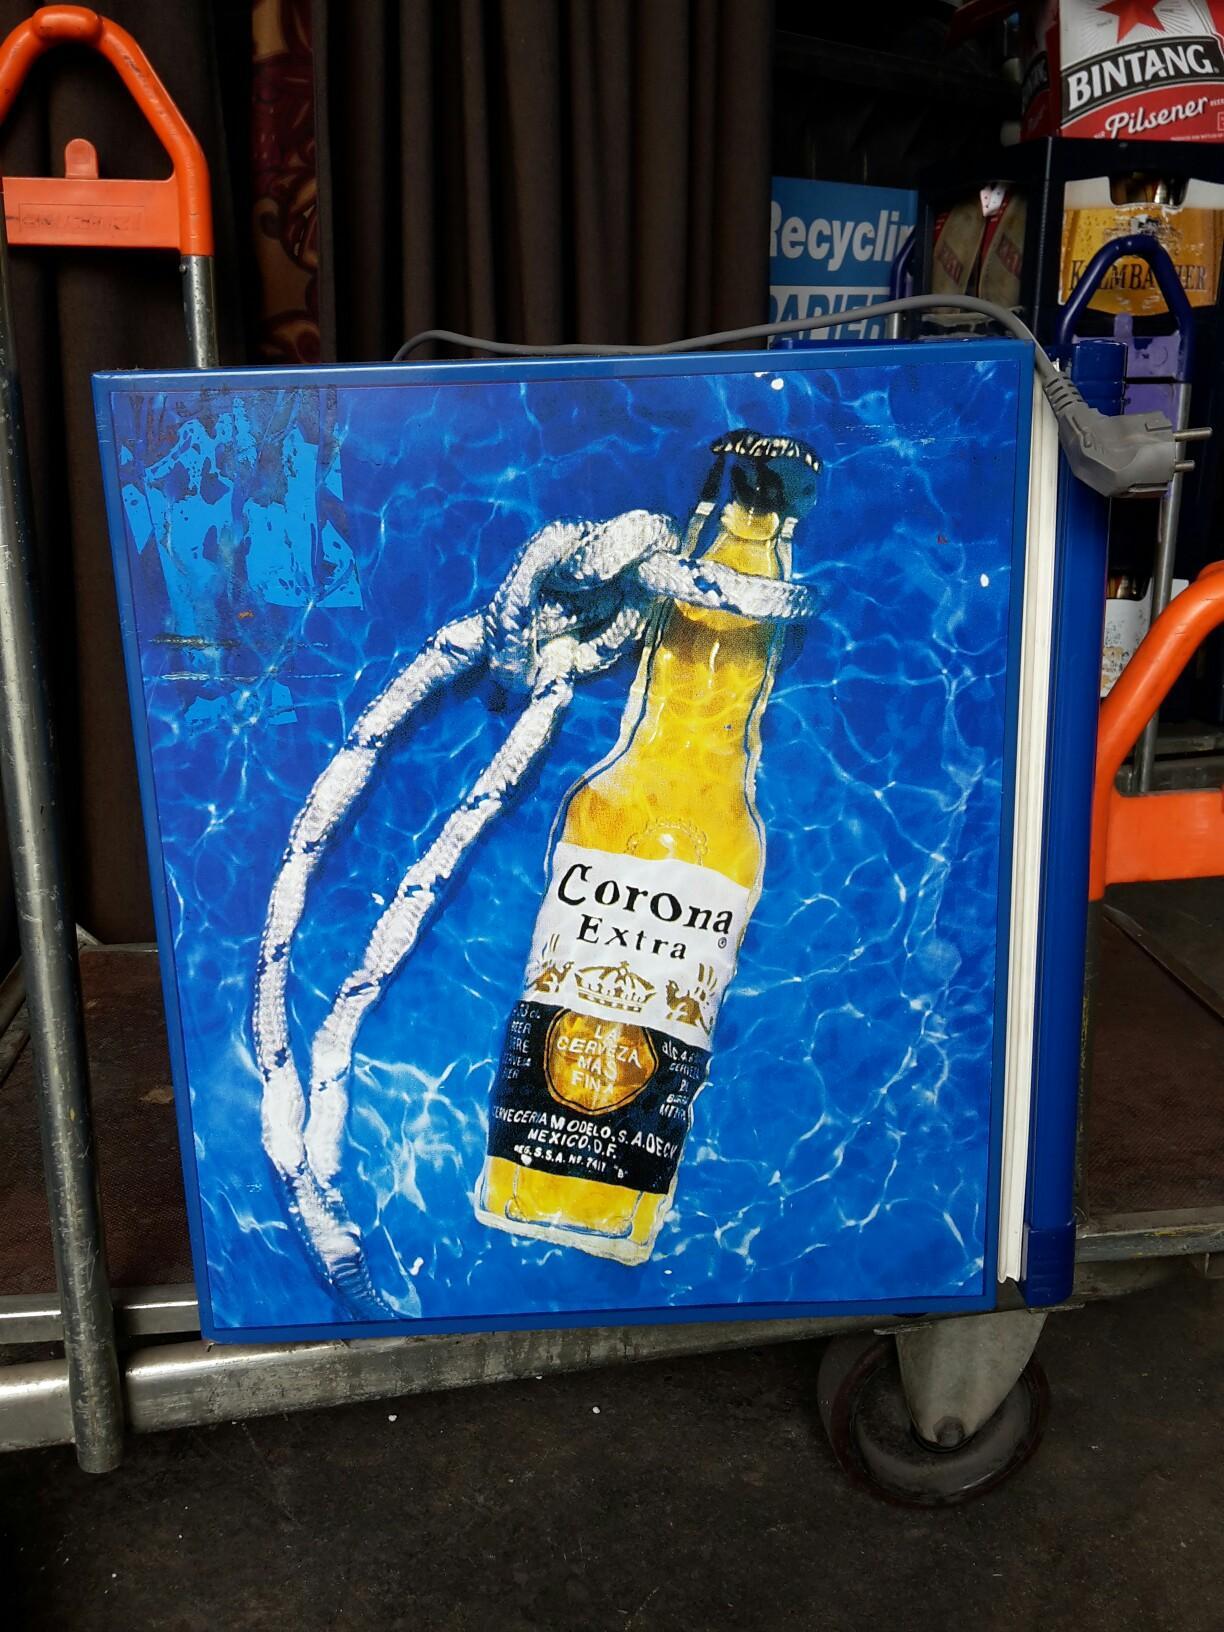 Mini Kühlschrank Corona : Gebraucht corona mini kühlschrank in norderstedt um u ac